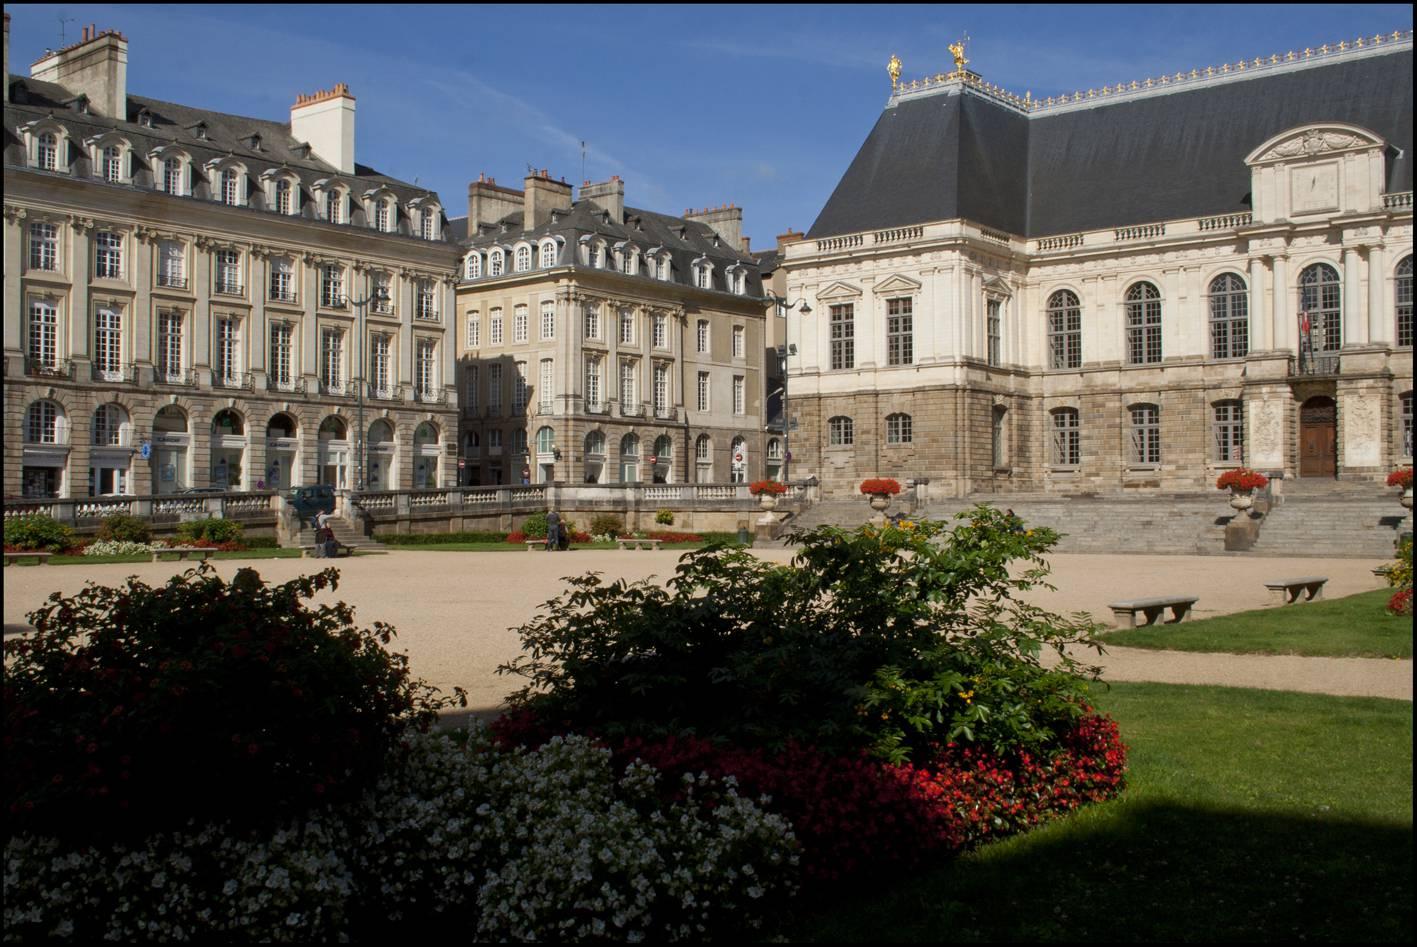 Visiter Rennes - Parlement de Bretagne